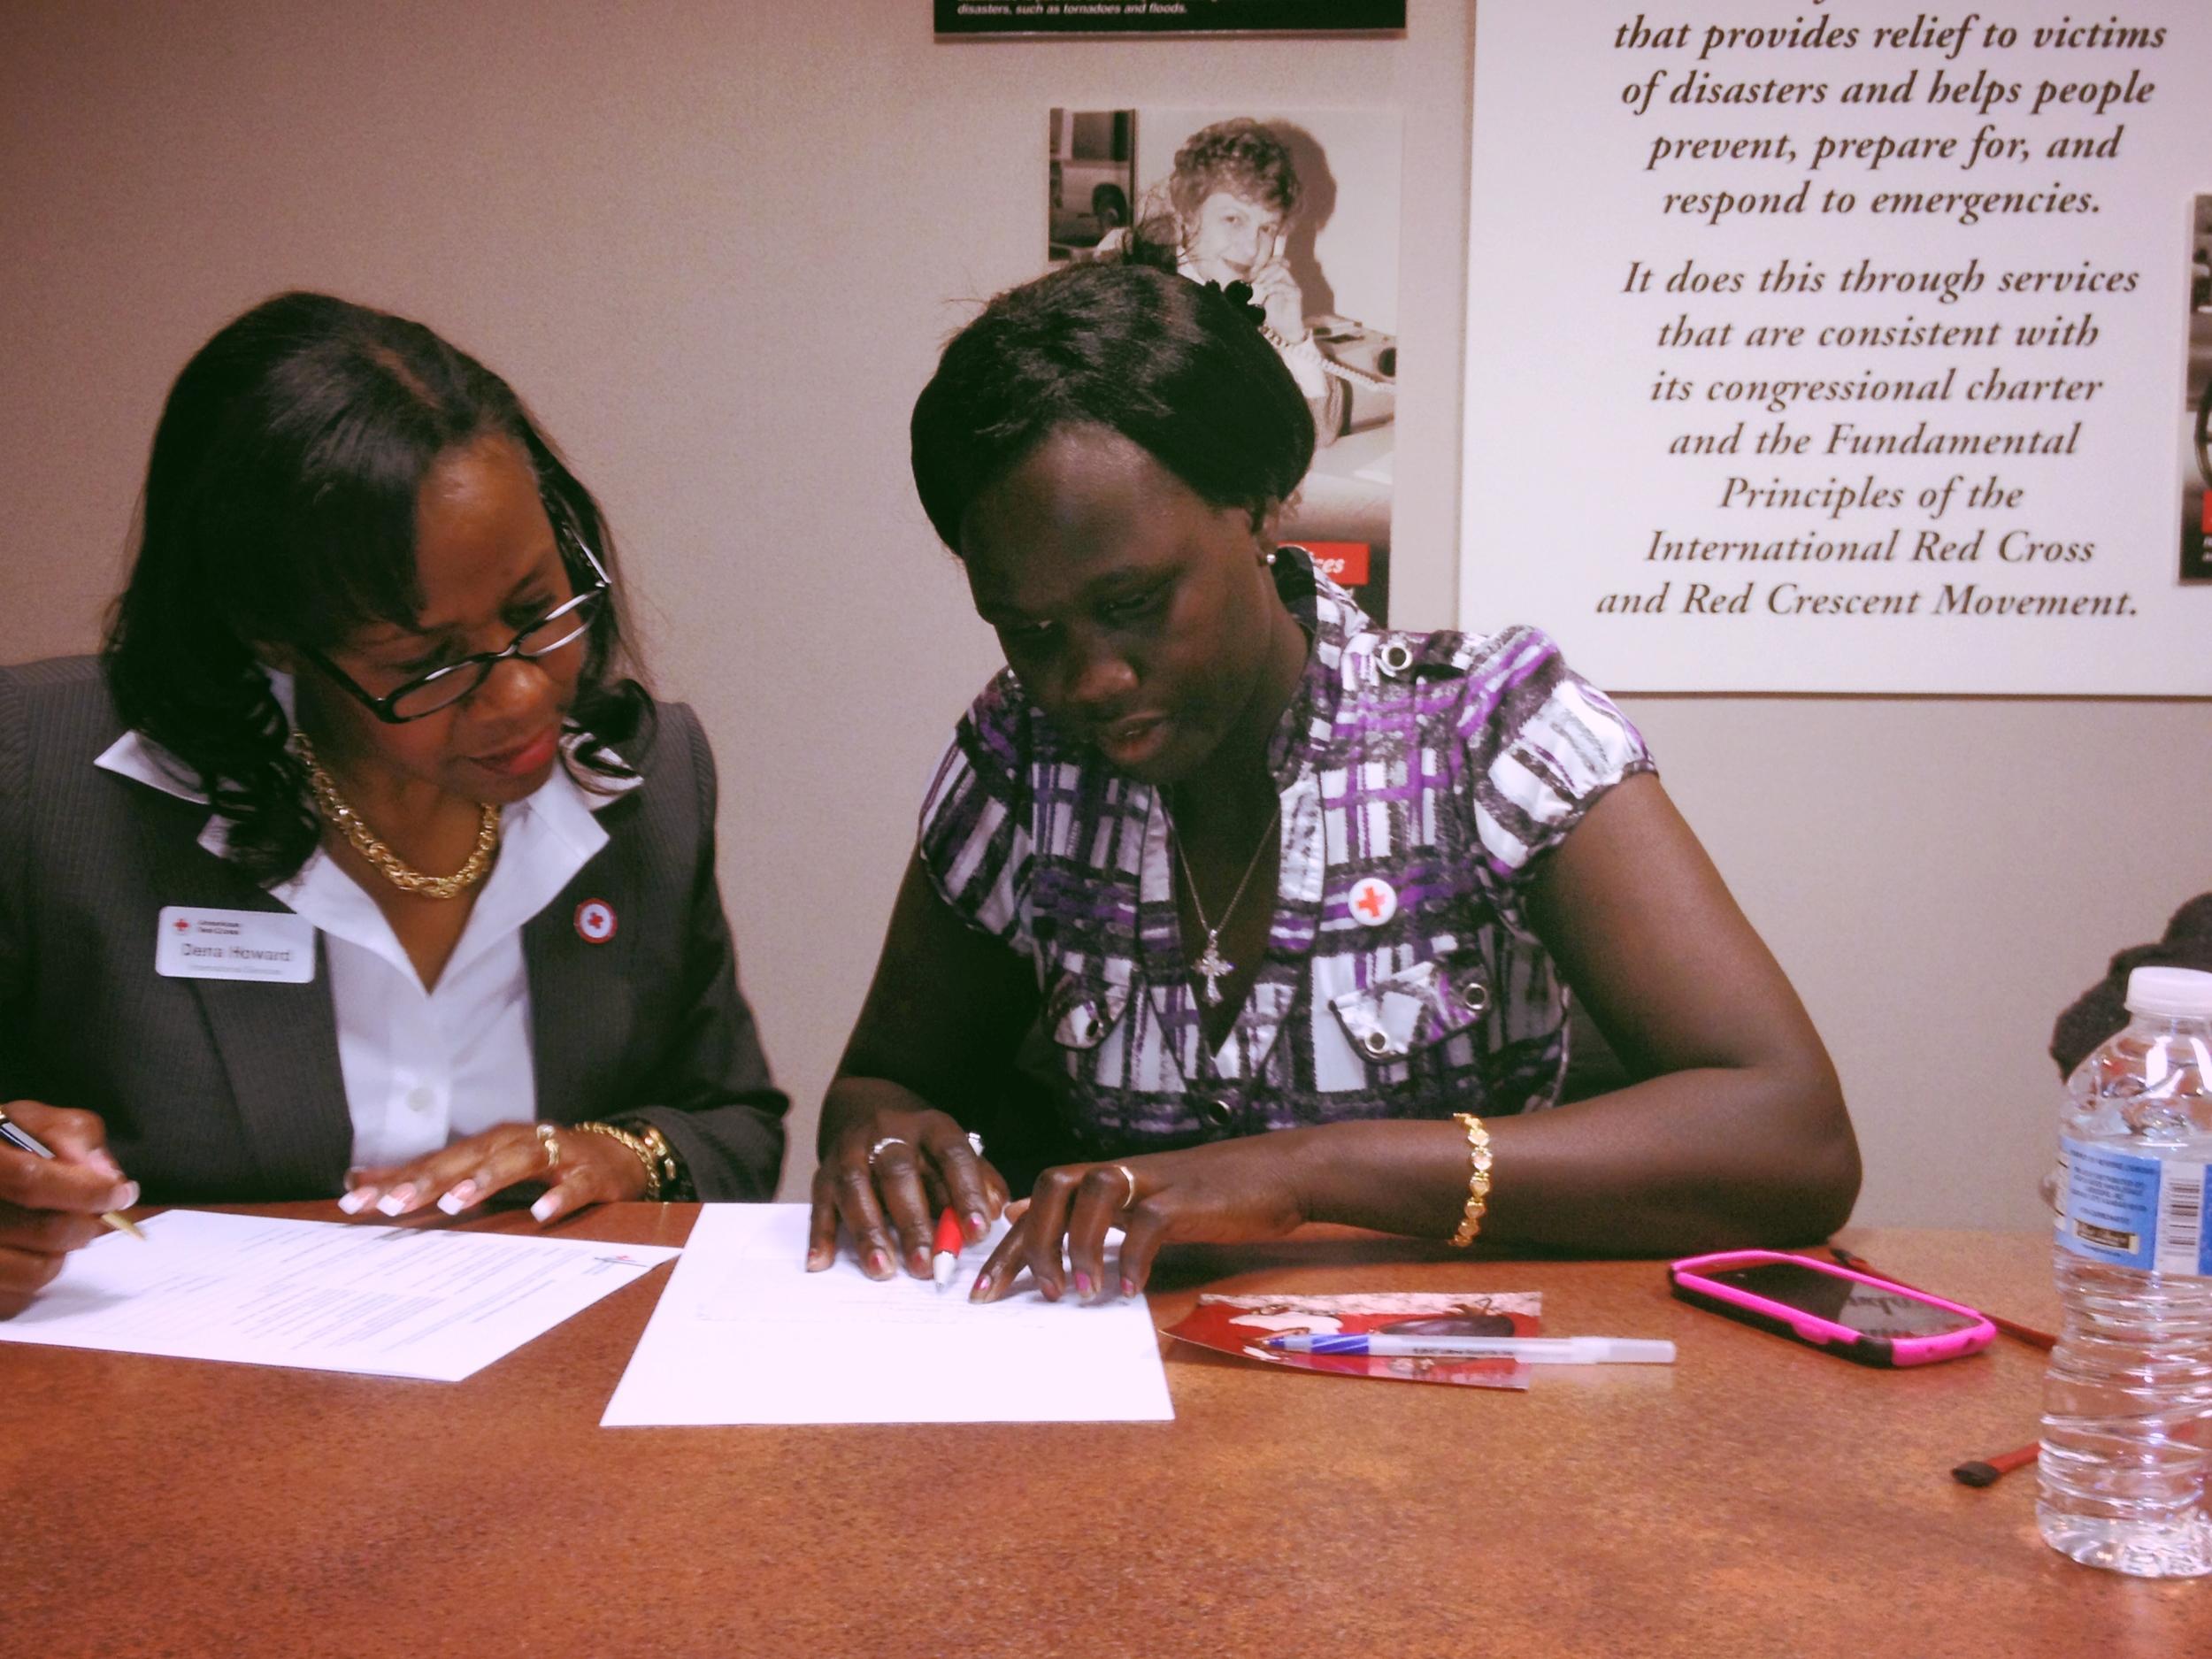 Rhoda Naylera Gatlek (right) works with American Red Cross caseworker, Dena Howard (left).